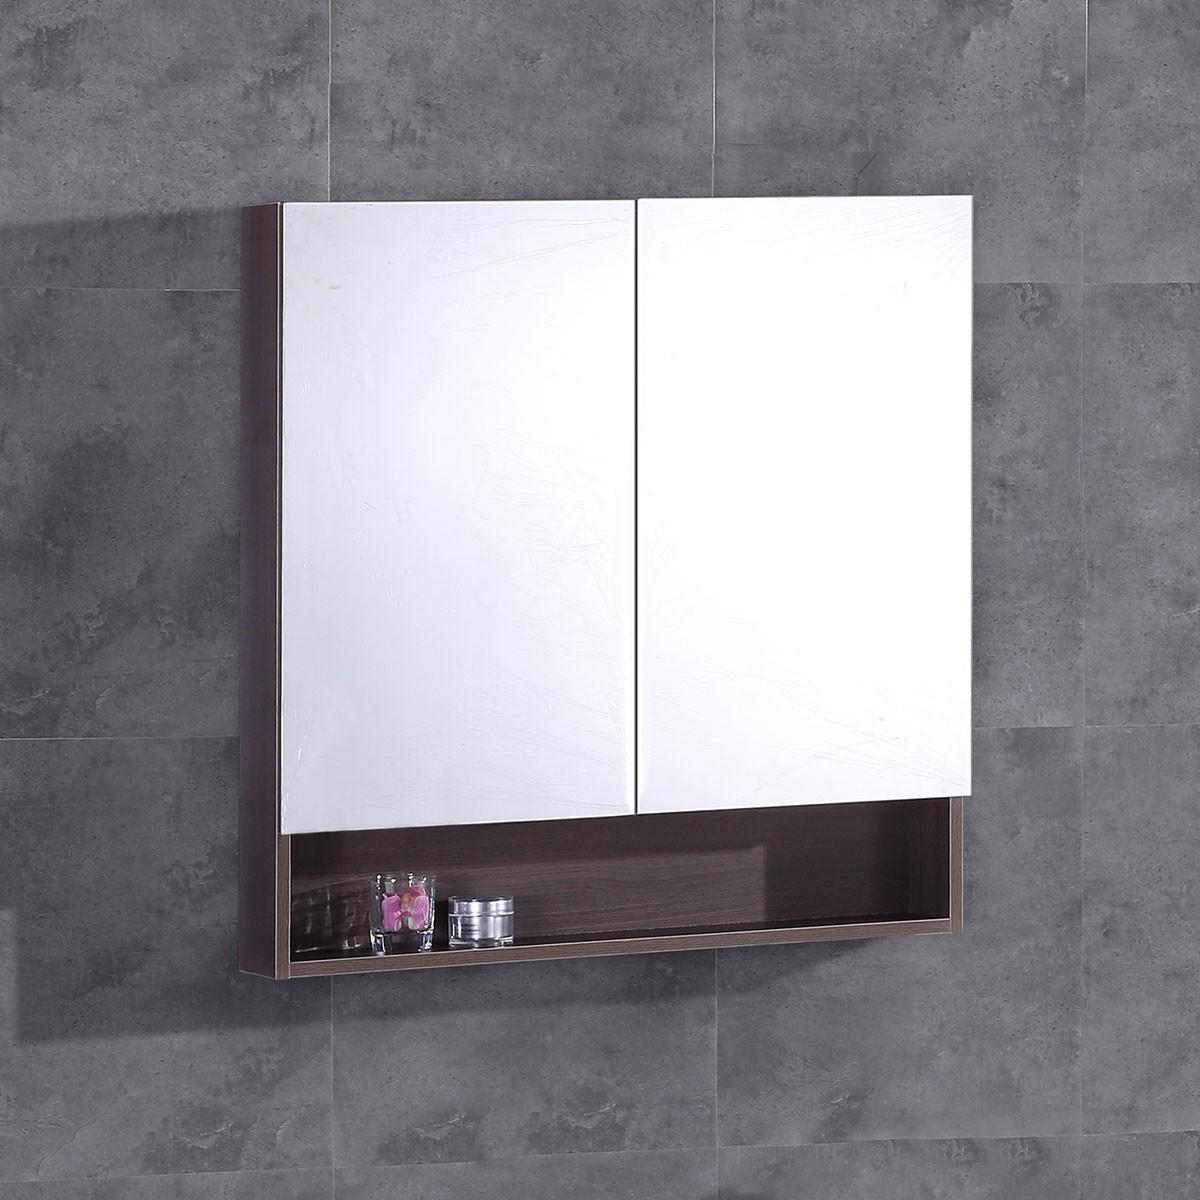 32 x 32 po Miroir pharmacie (DK-T5007-M)